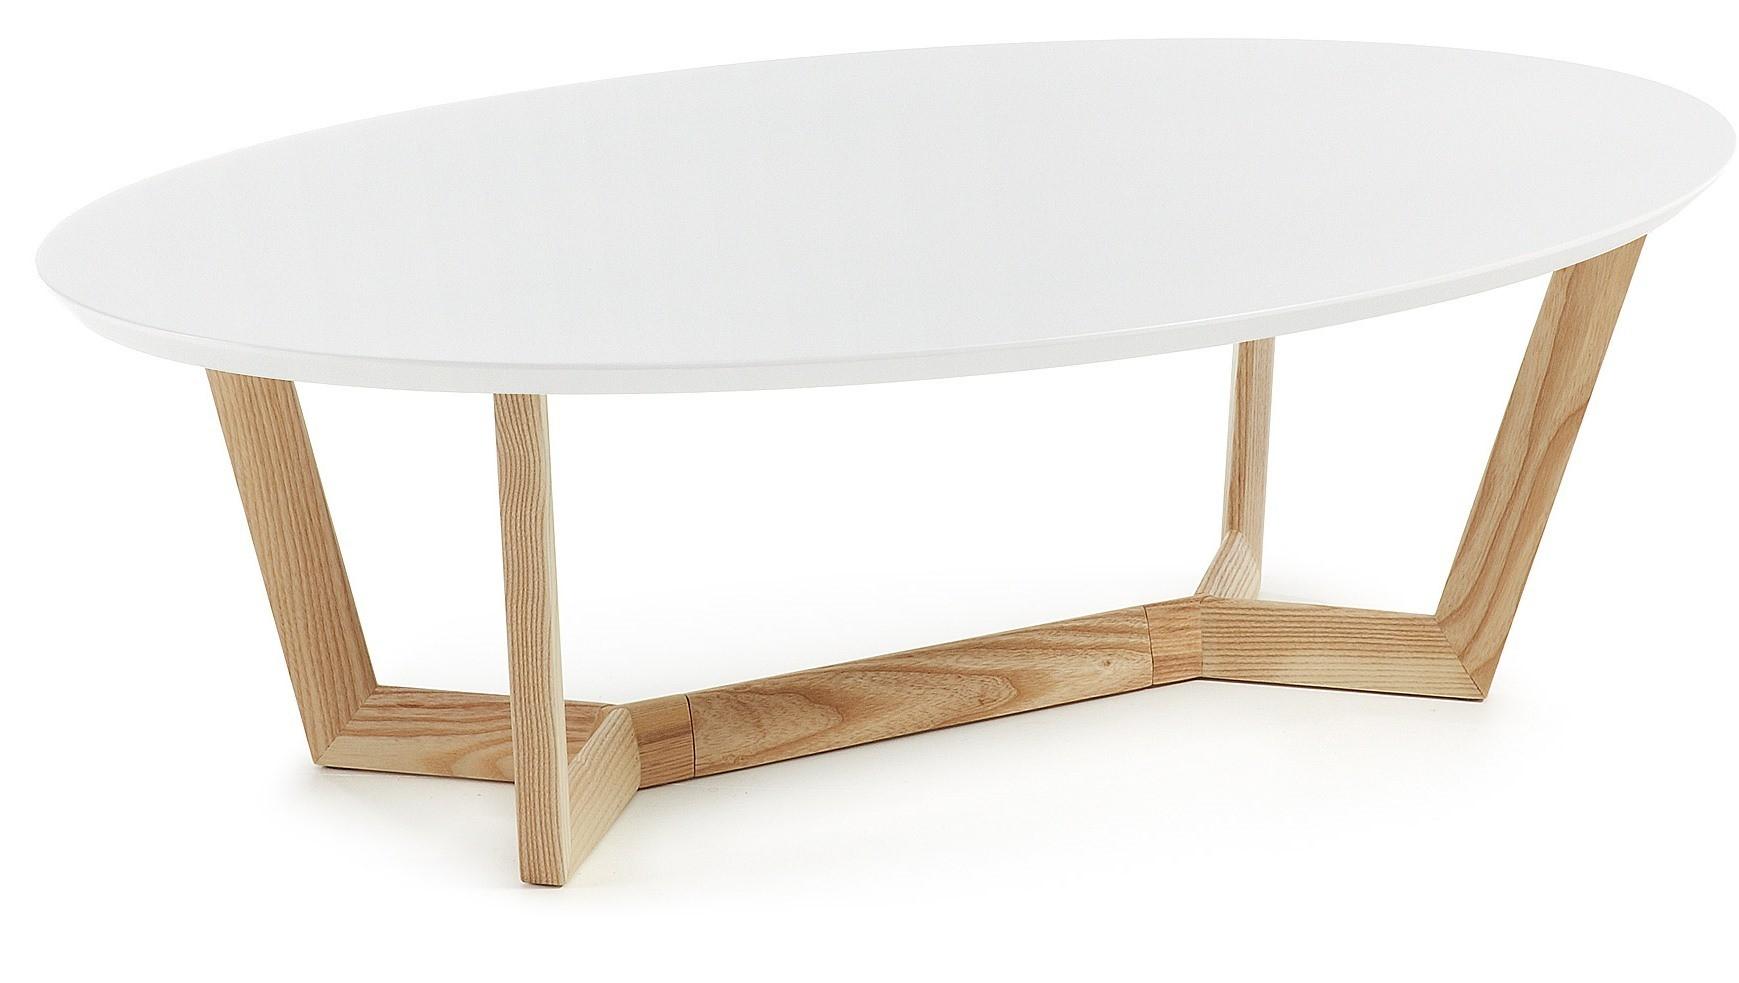 Base tavolo legno kj12 regardsdefemmes for Tavolo ovale bianco design